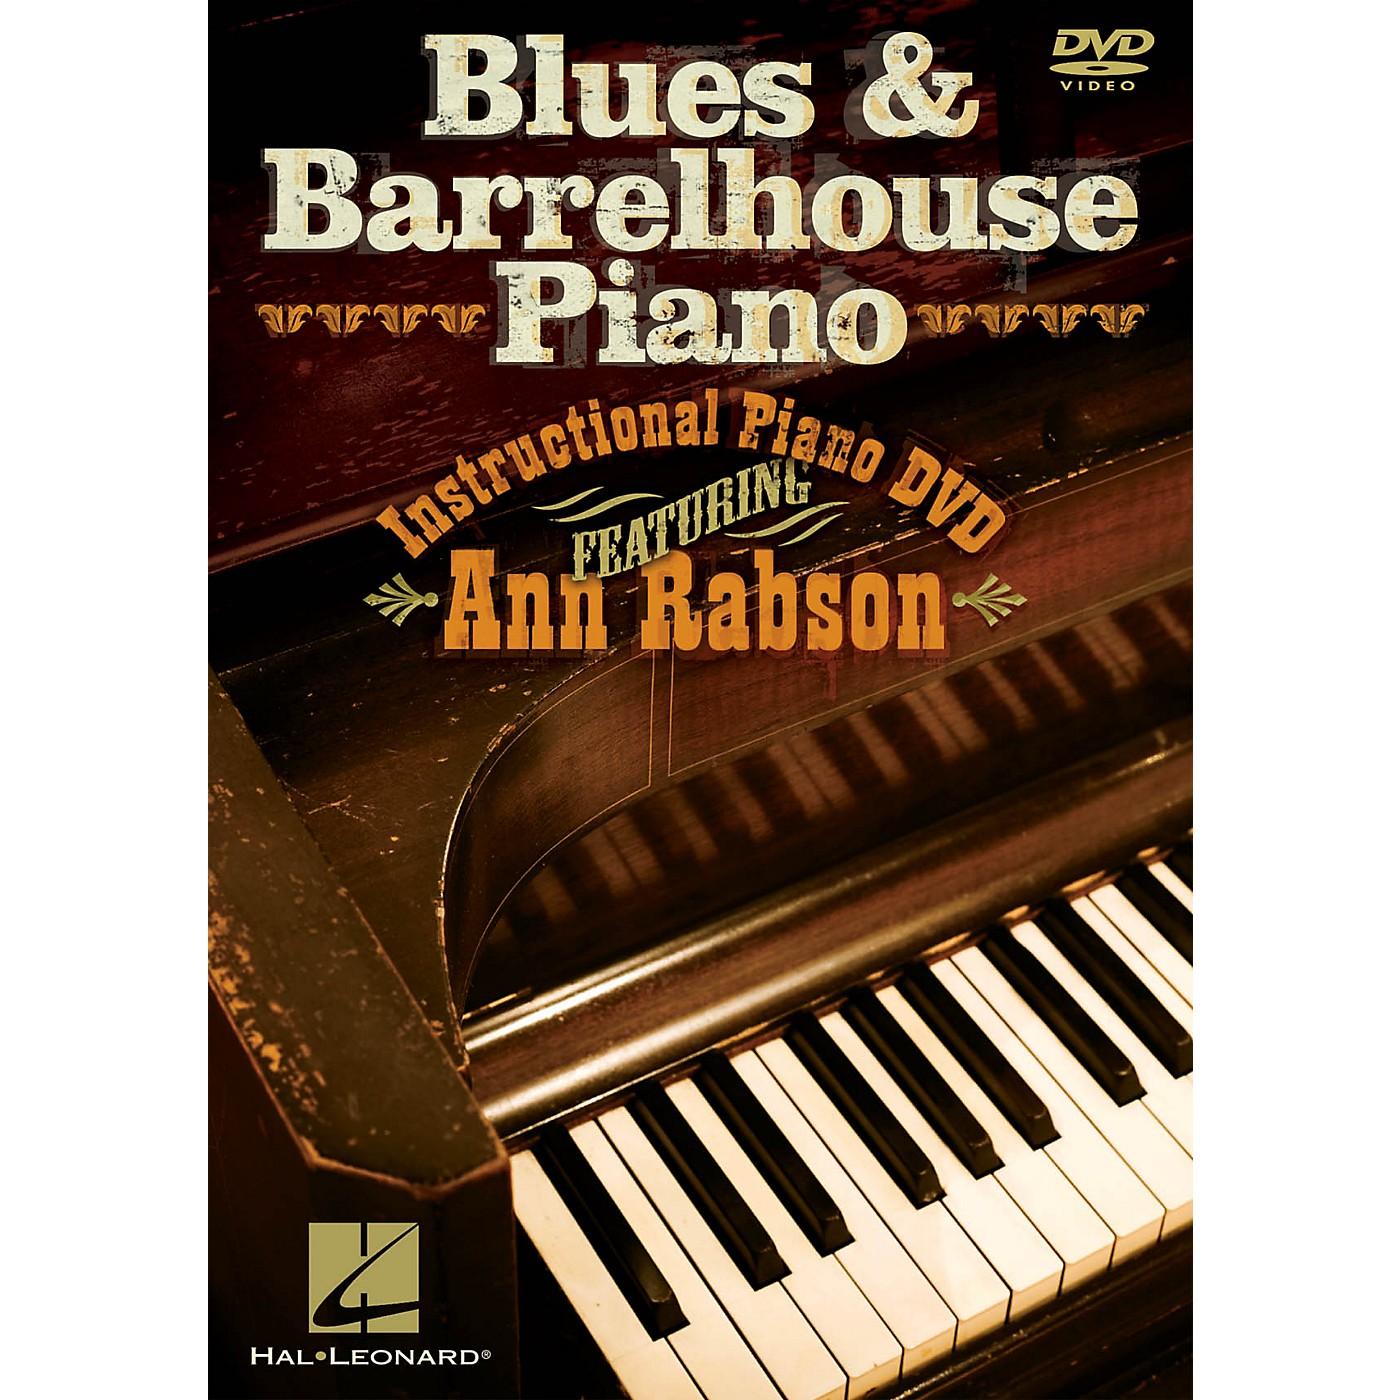 Hal Leonard Blues & Barrelhouse Piano (Instructional Piano DVD featuring Ann Rabson) DVD Series DVD by Ann Rabson thumbnail